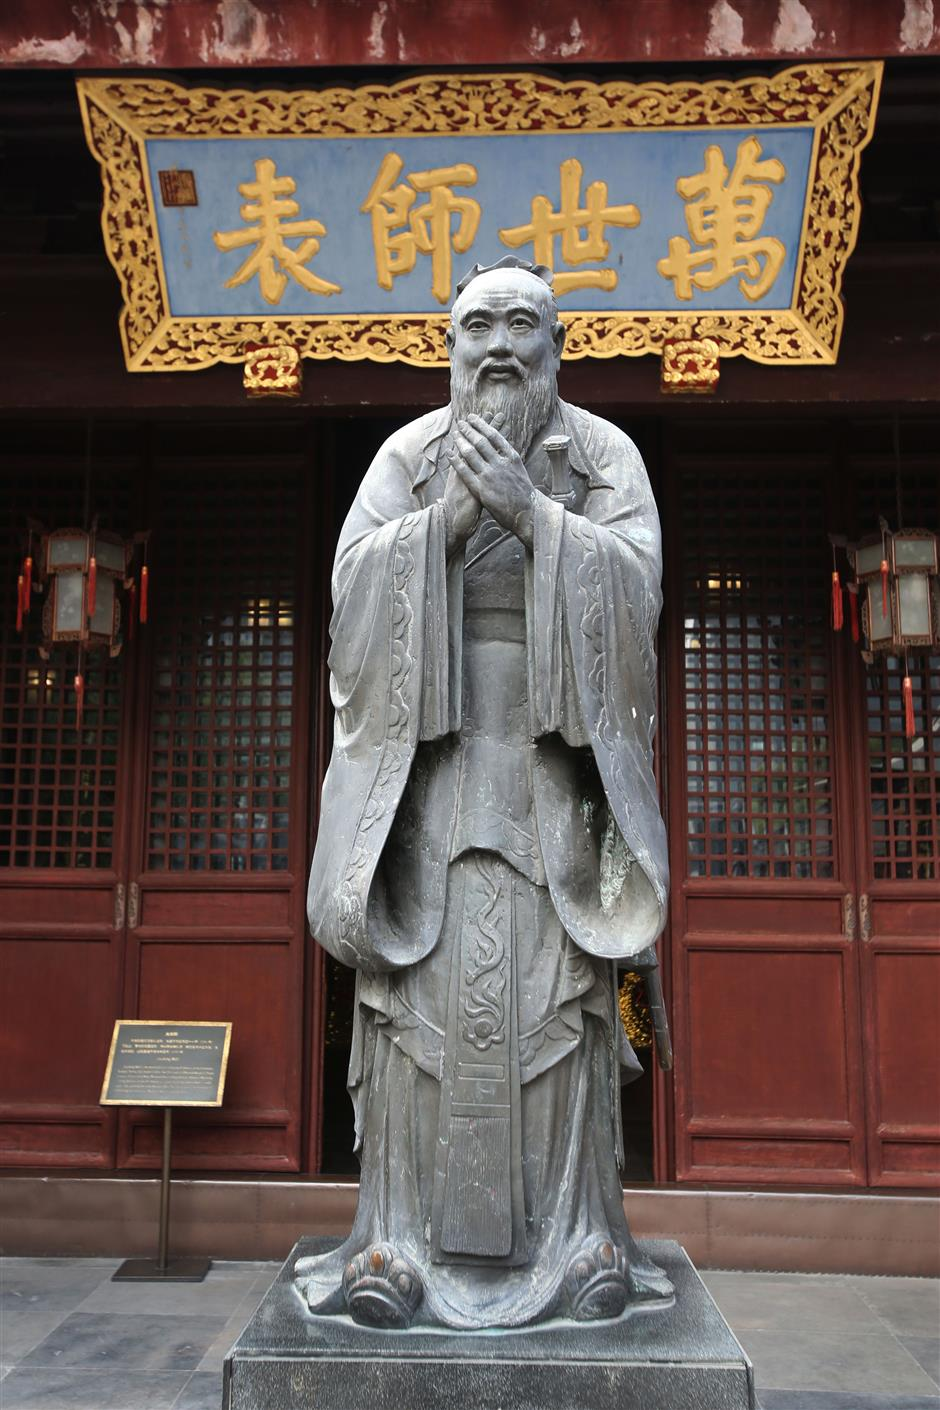 Solemnity marks shrine of worship and education